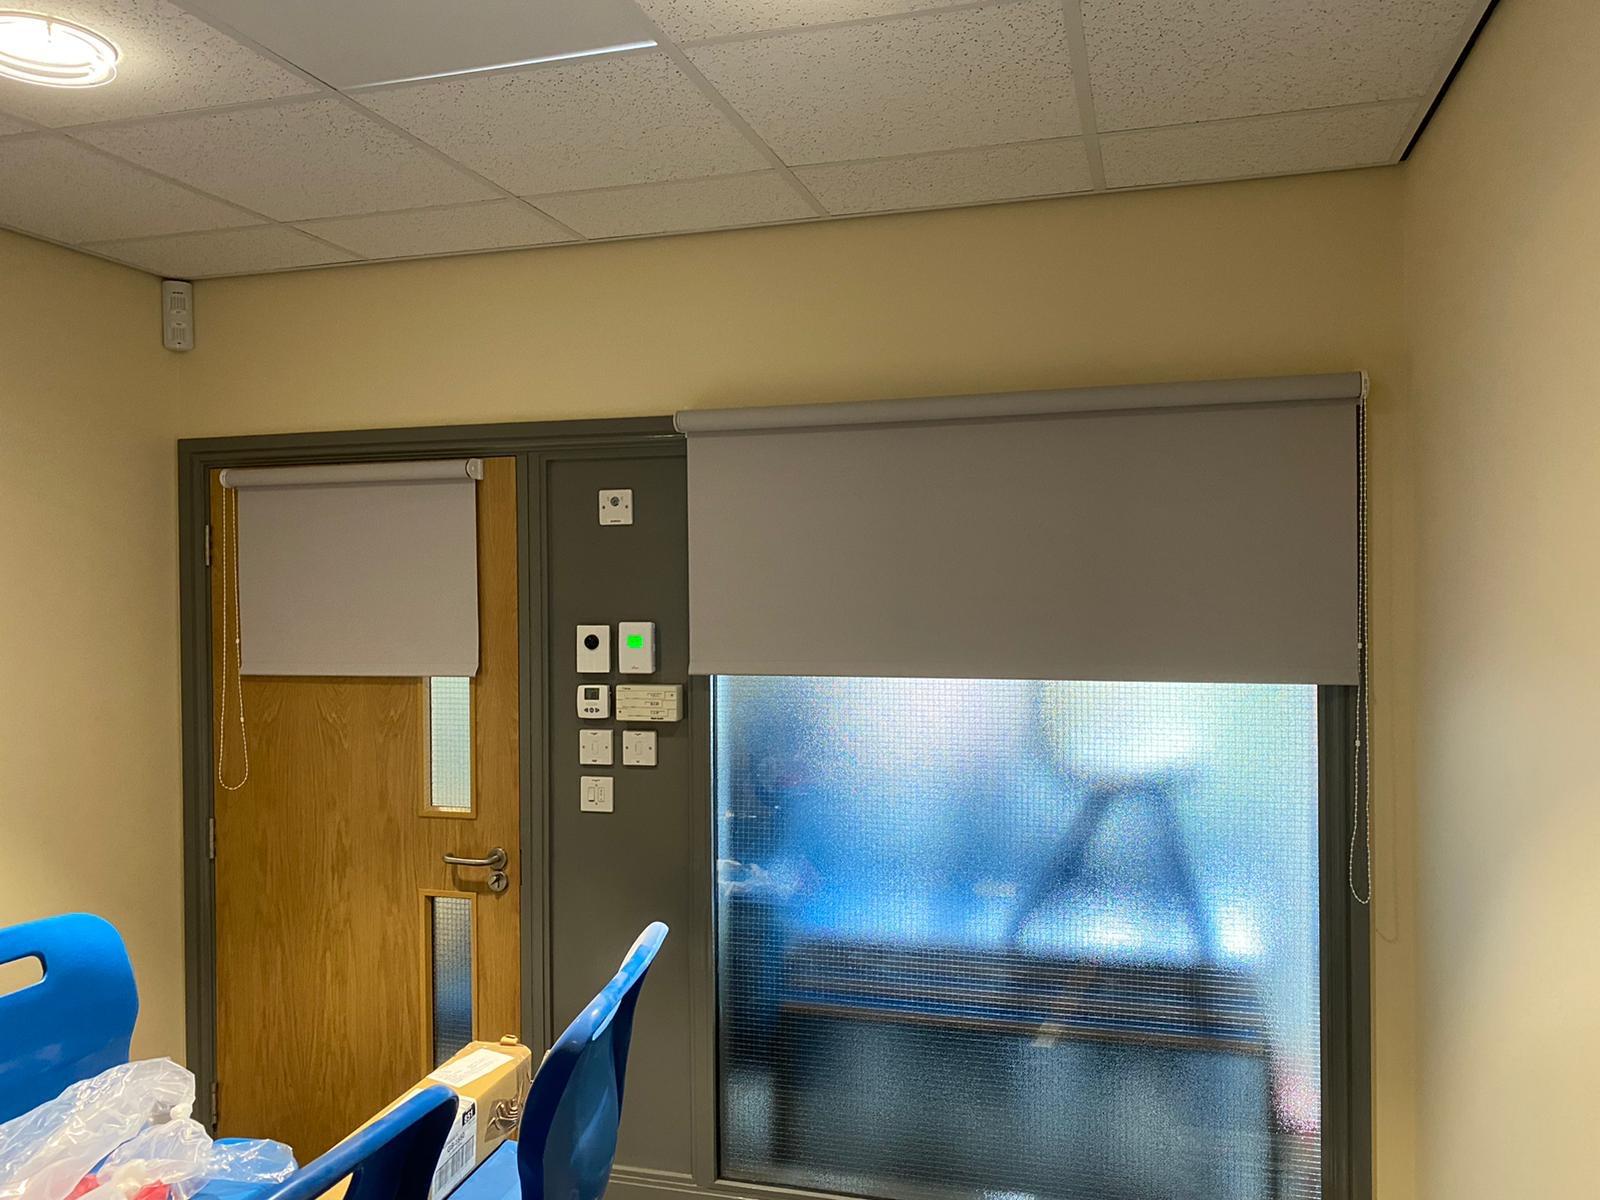 office blinds in stoke